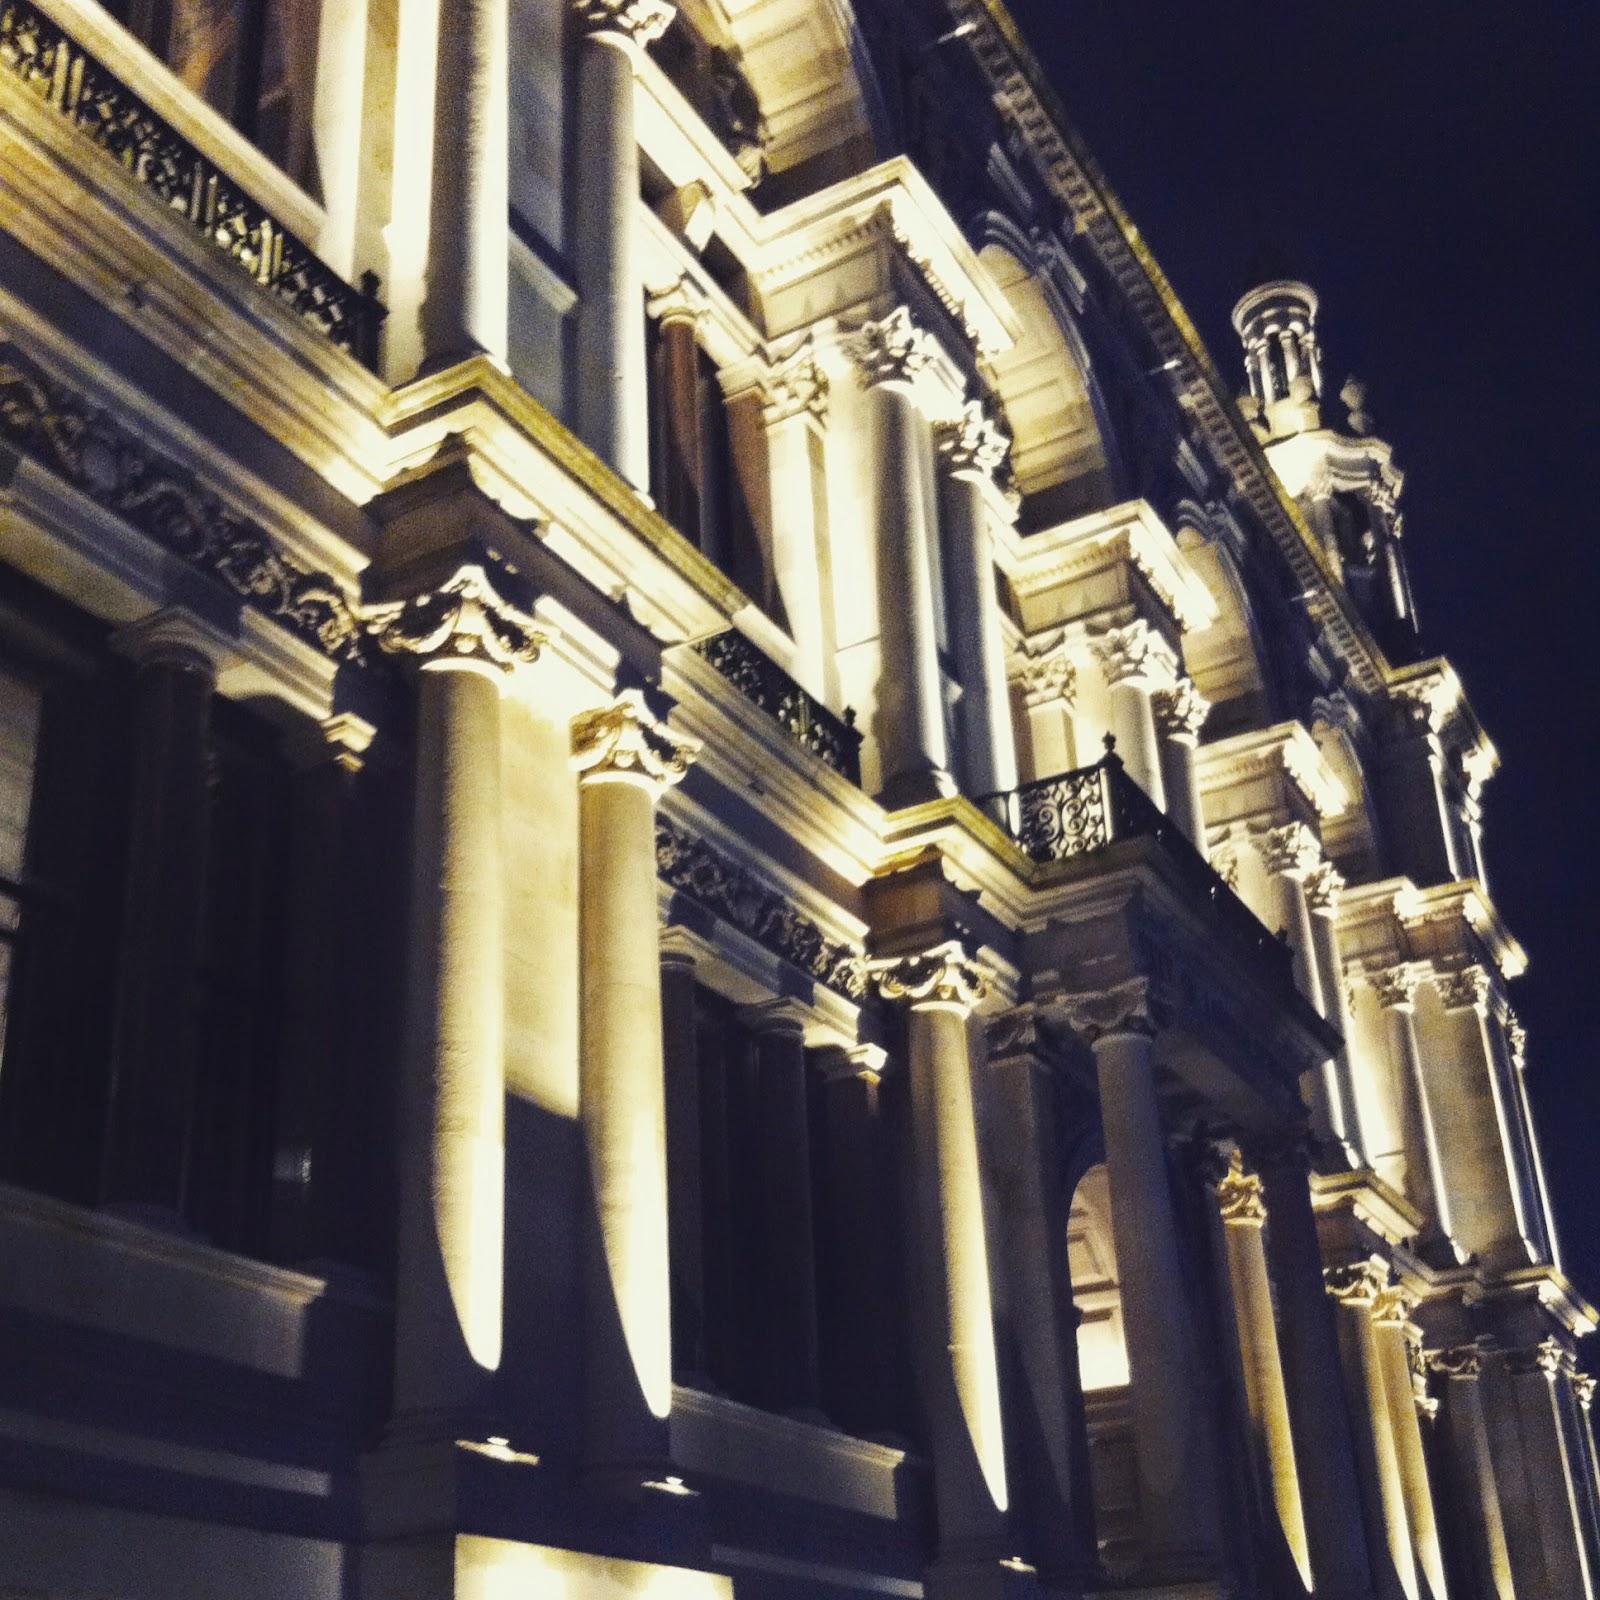 London Building at night